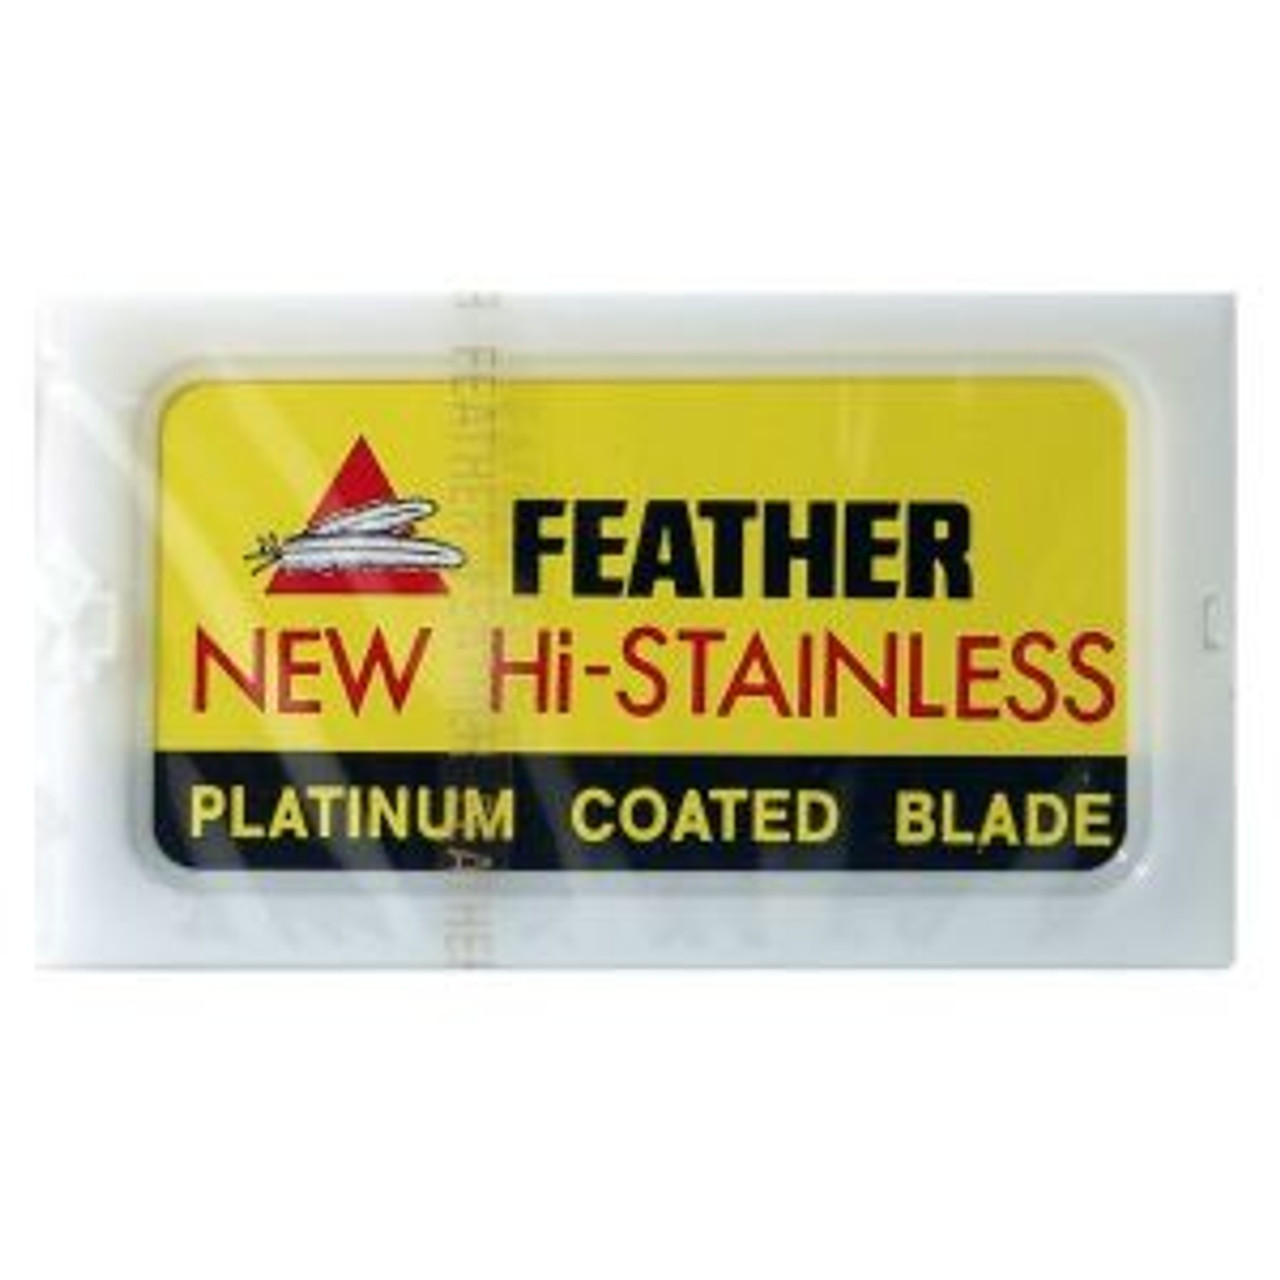 Feather Double Edge Razor Blades